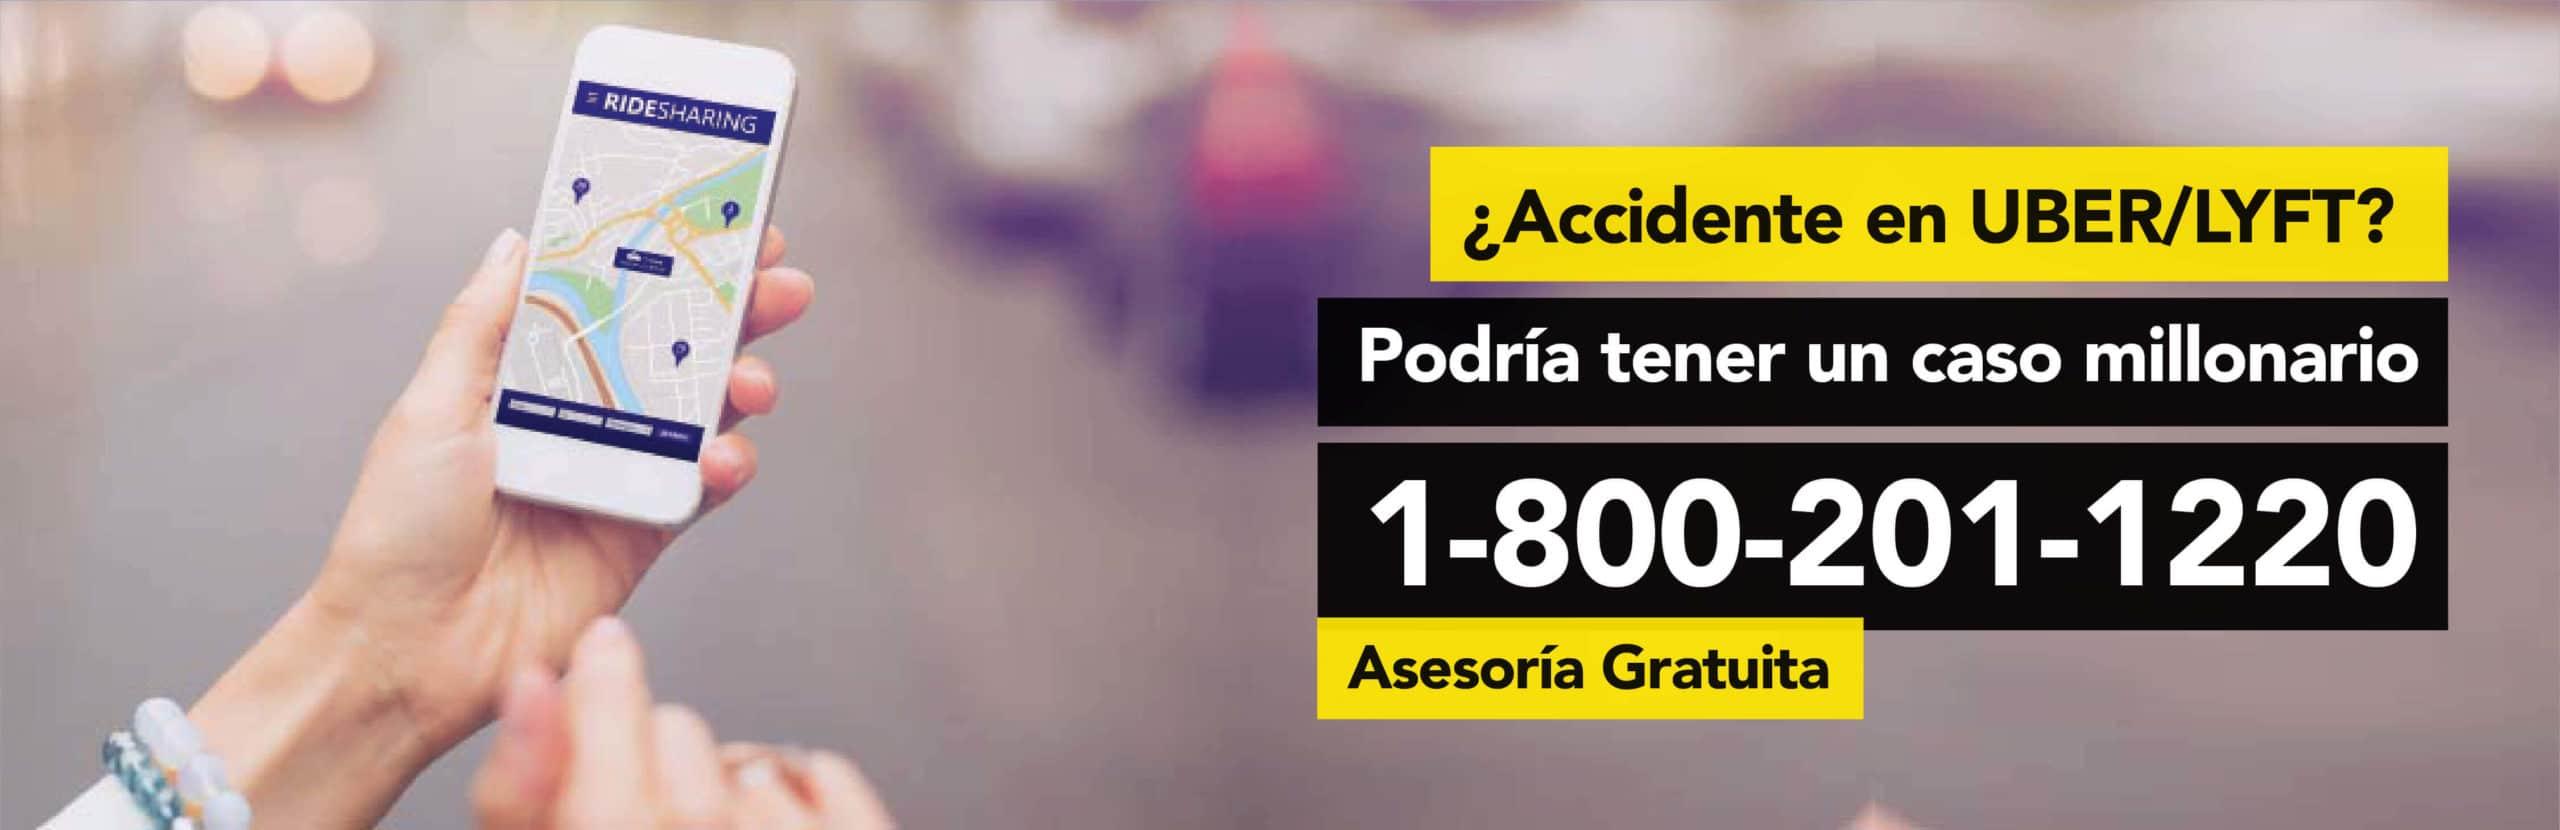 Accidente de Uber/Lyft